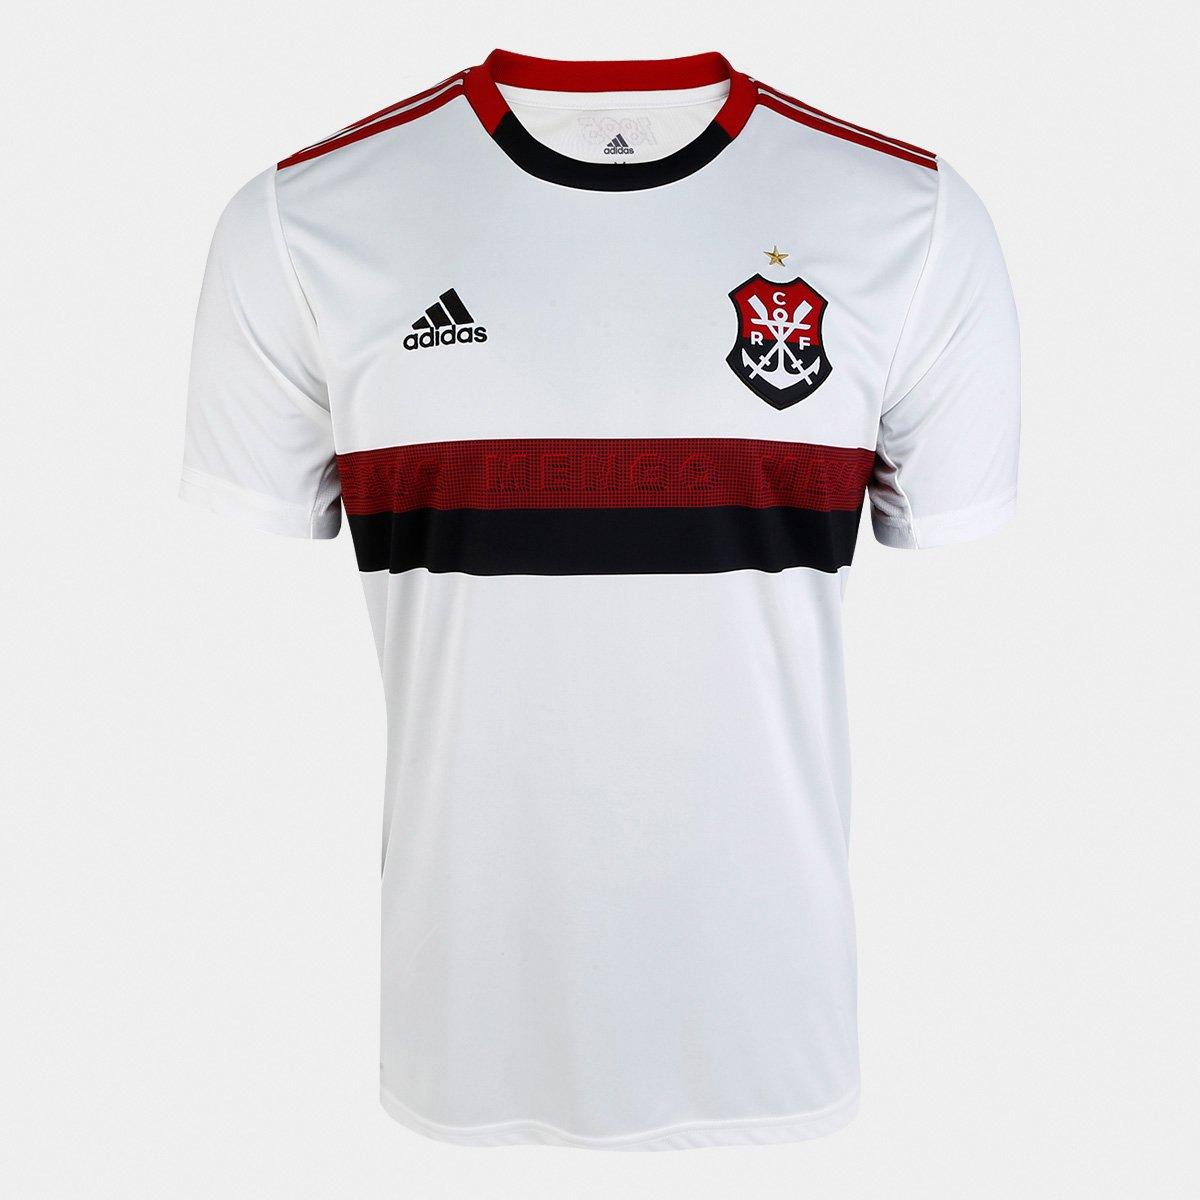 668adef5f Camisa Flamengo II 19 20 s nº Torcedor Adidas Masculina - Branco e Vermelho